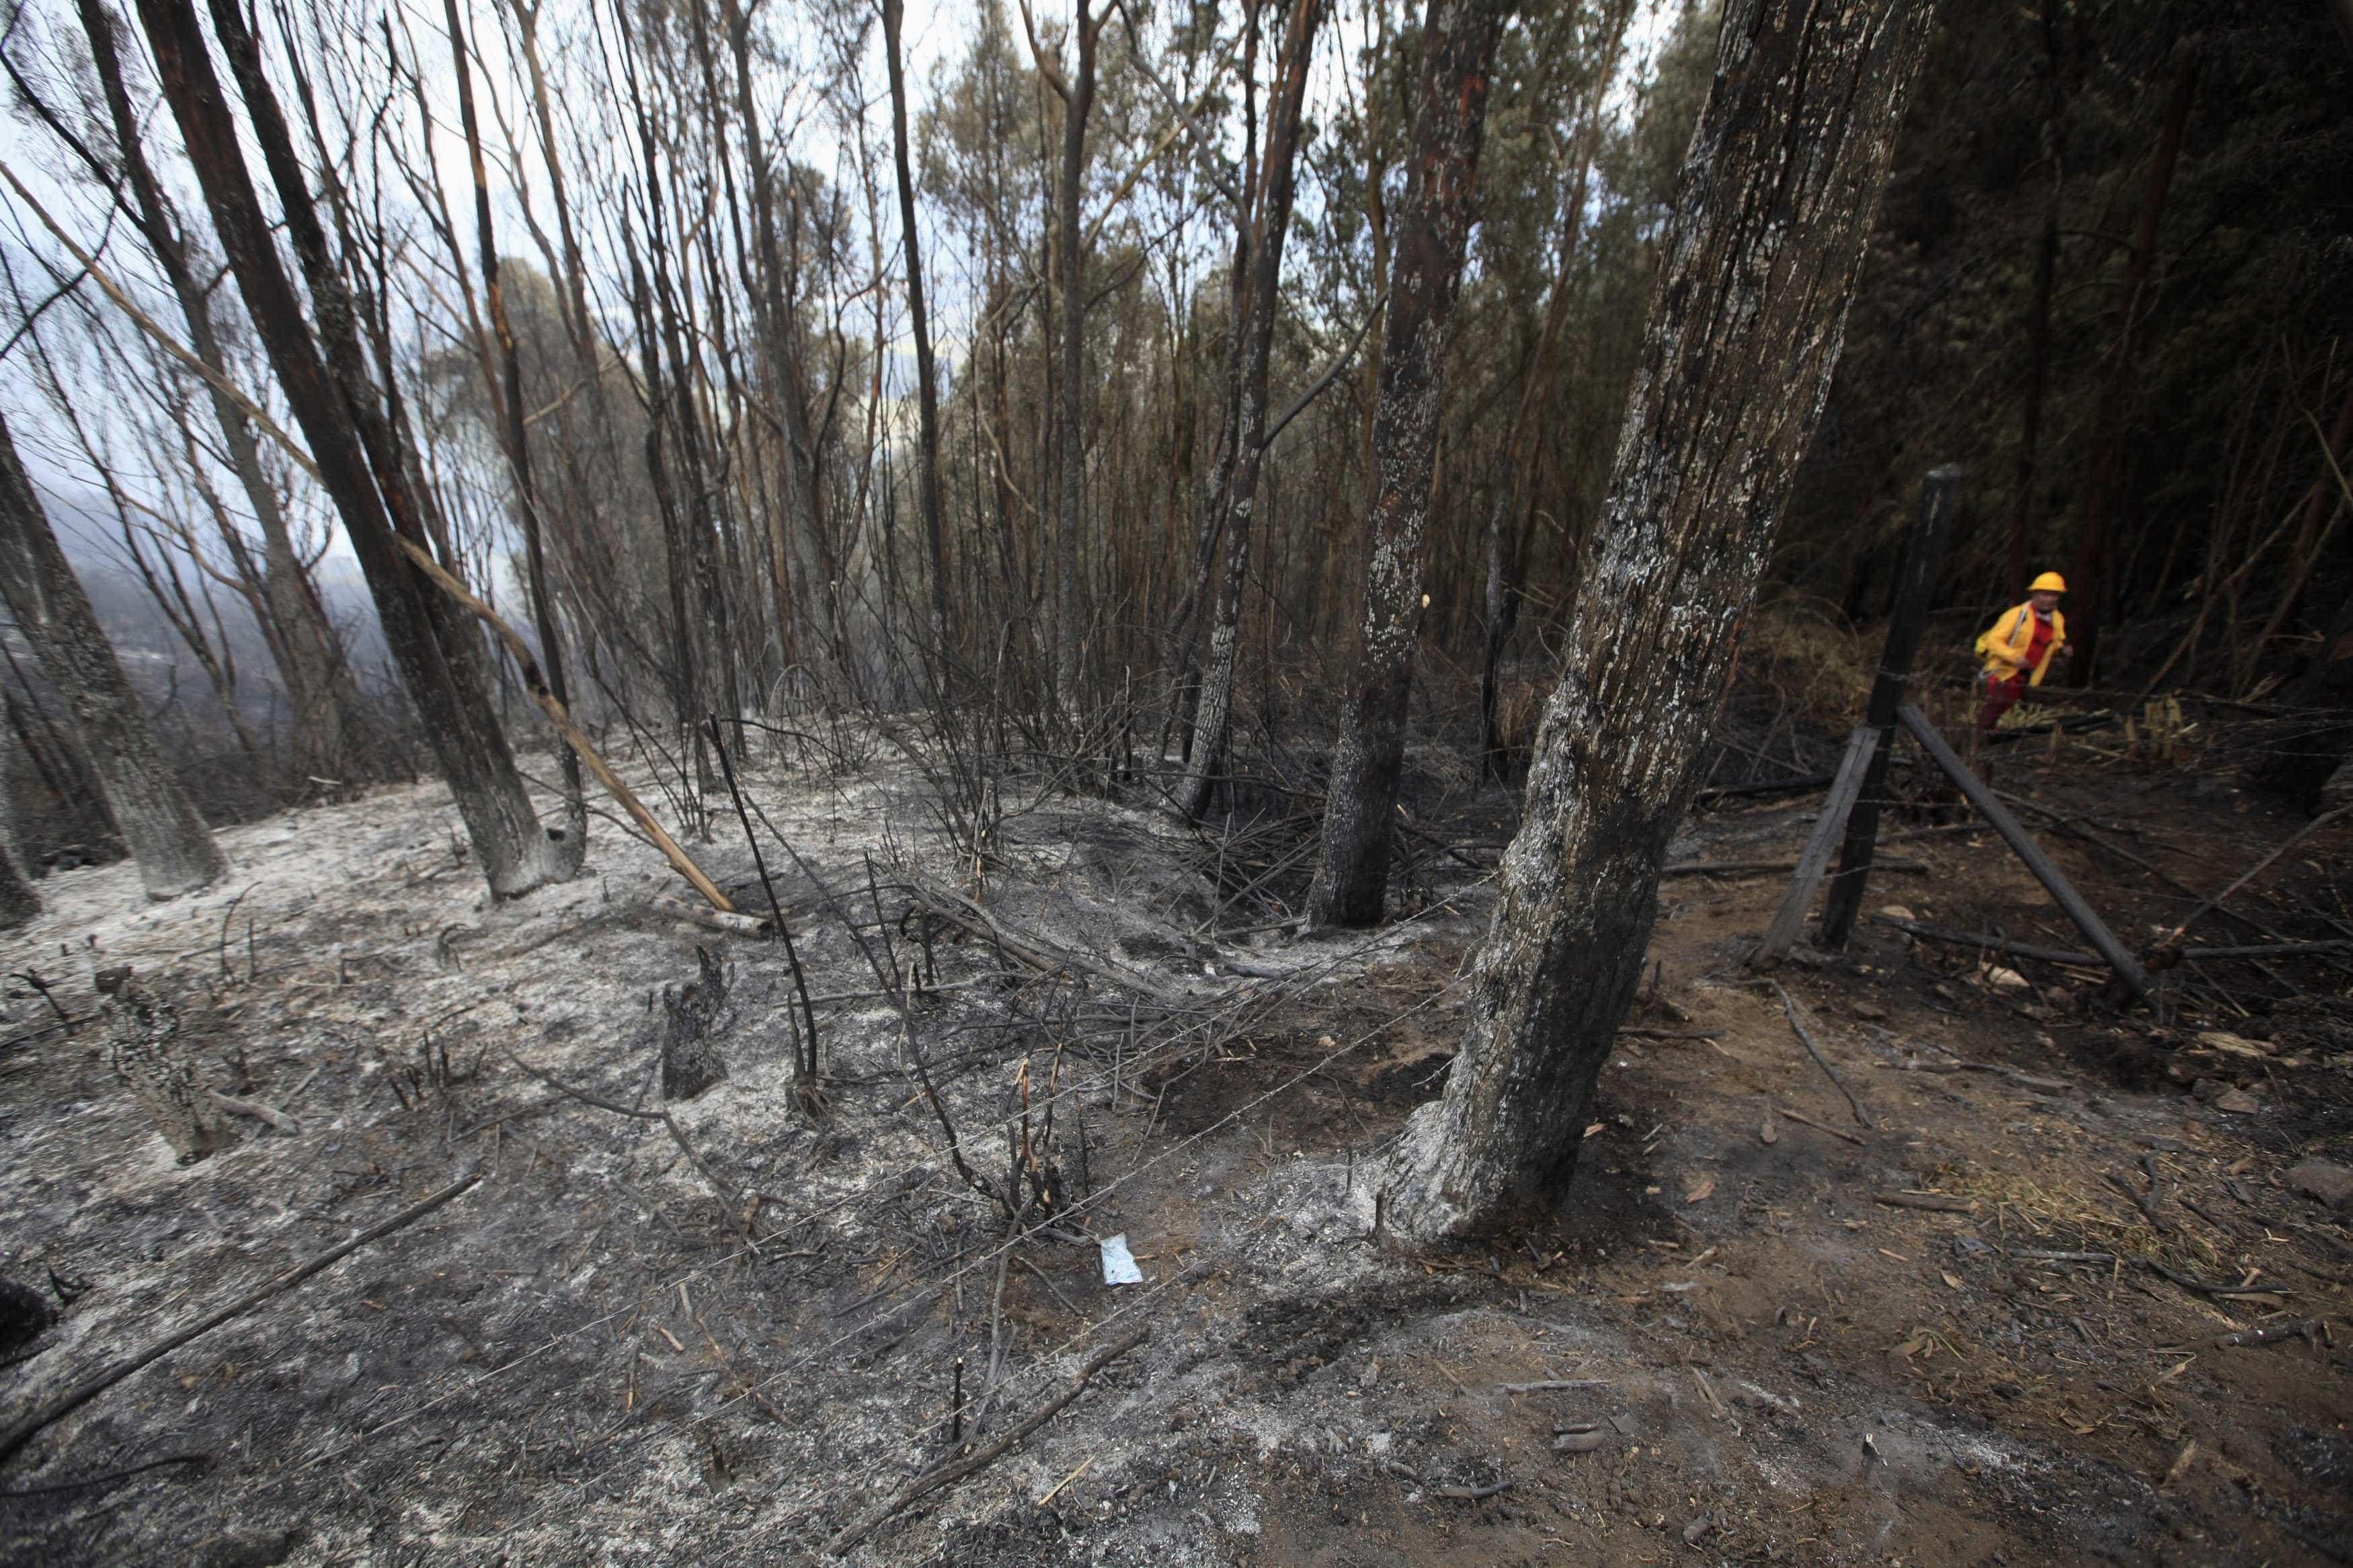 Estudo apresenta novas evidências do potencial invasor do eucalipto